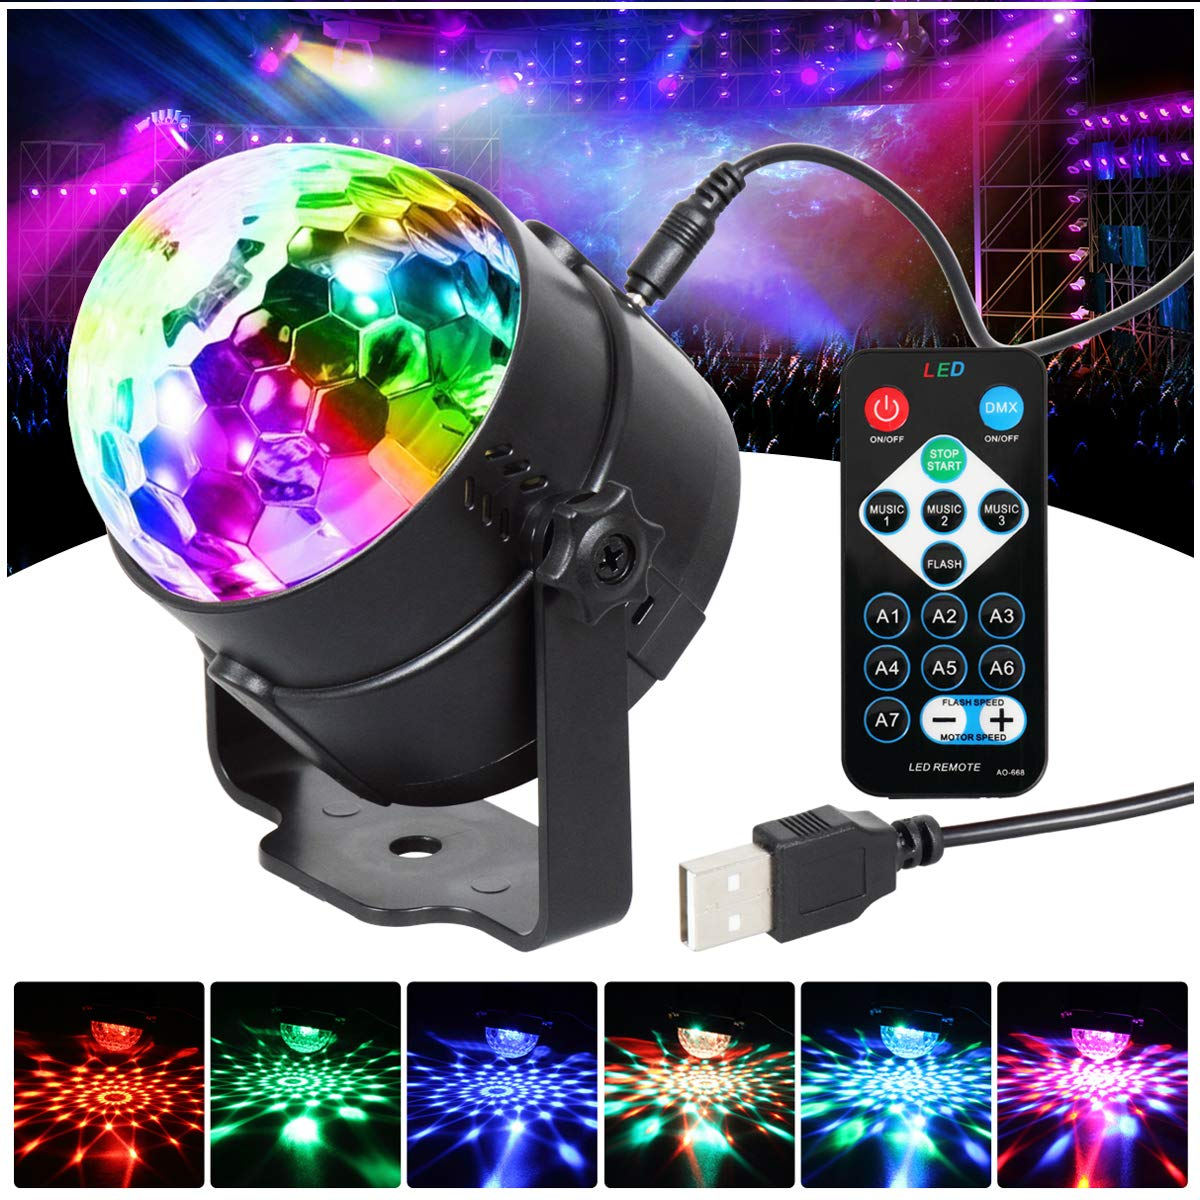 Party Lights Disco Ball 7 Colors Sound Activated Stage Disco Lights Remote Control Strobe Lamp USB Plug in 5Vlaser Lighting LED Effect Show RBG Dance Ball Mood light For Birthday DJ Bar Pub Club Kara